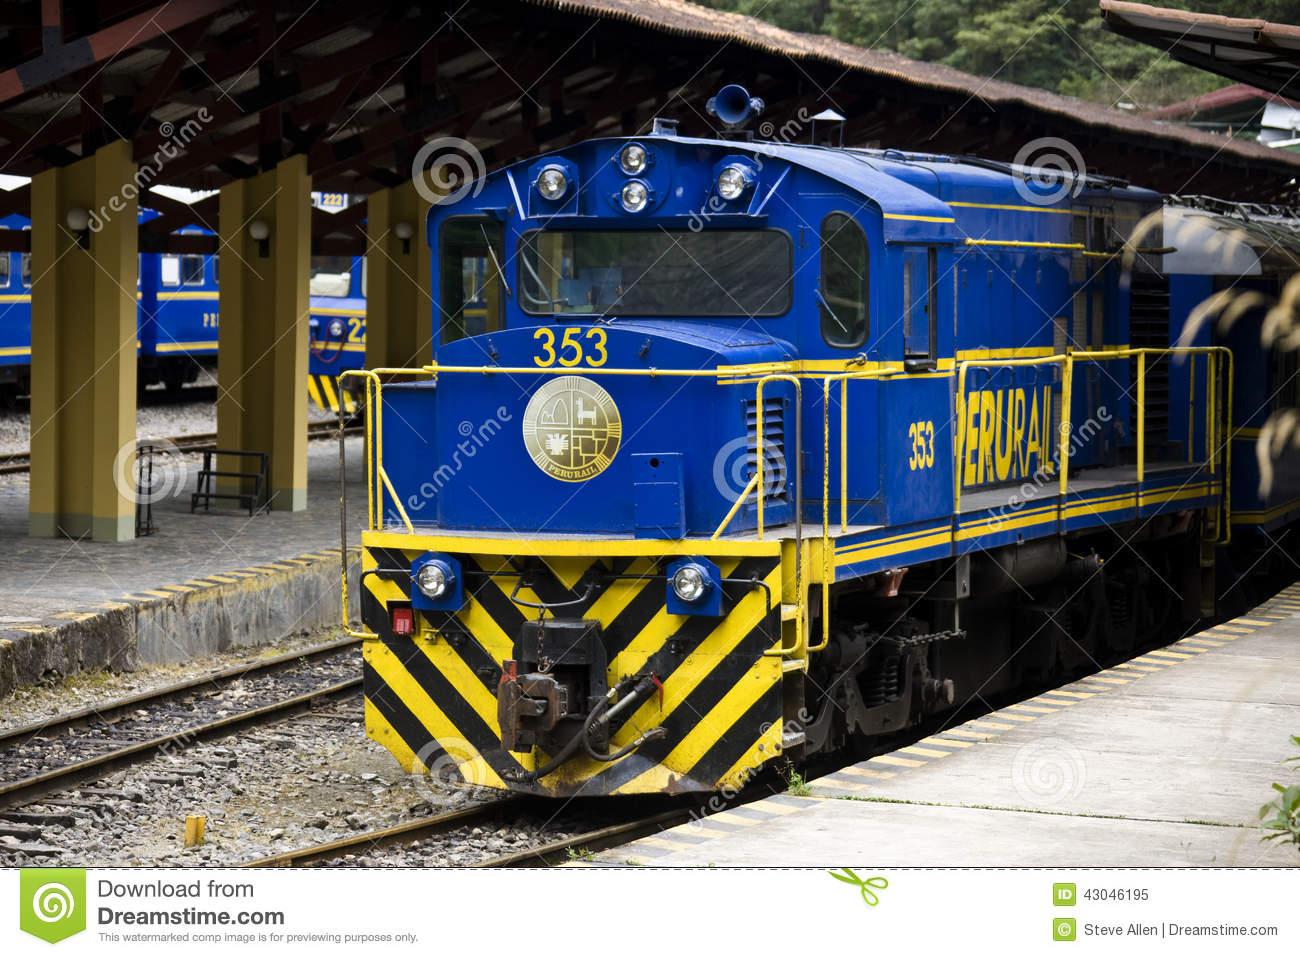 Perurail Trains.